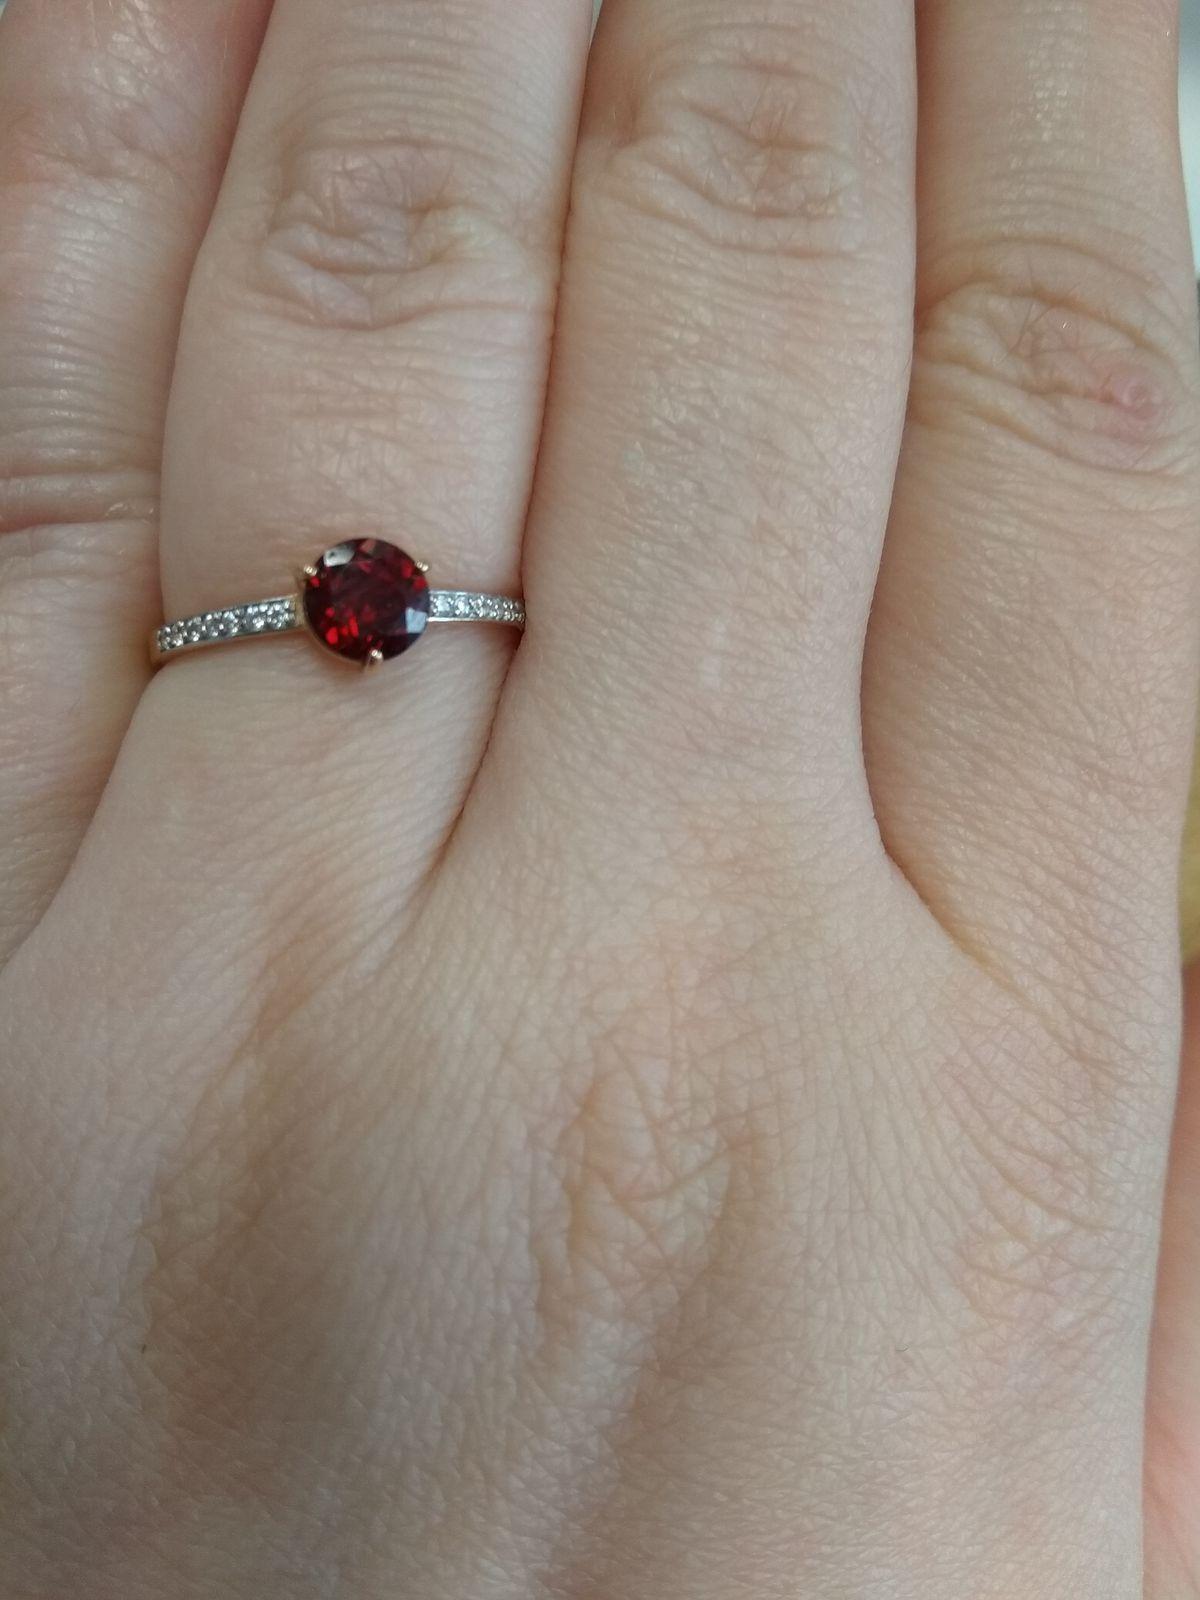 Красивое кольцо,безумно нравиться